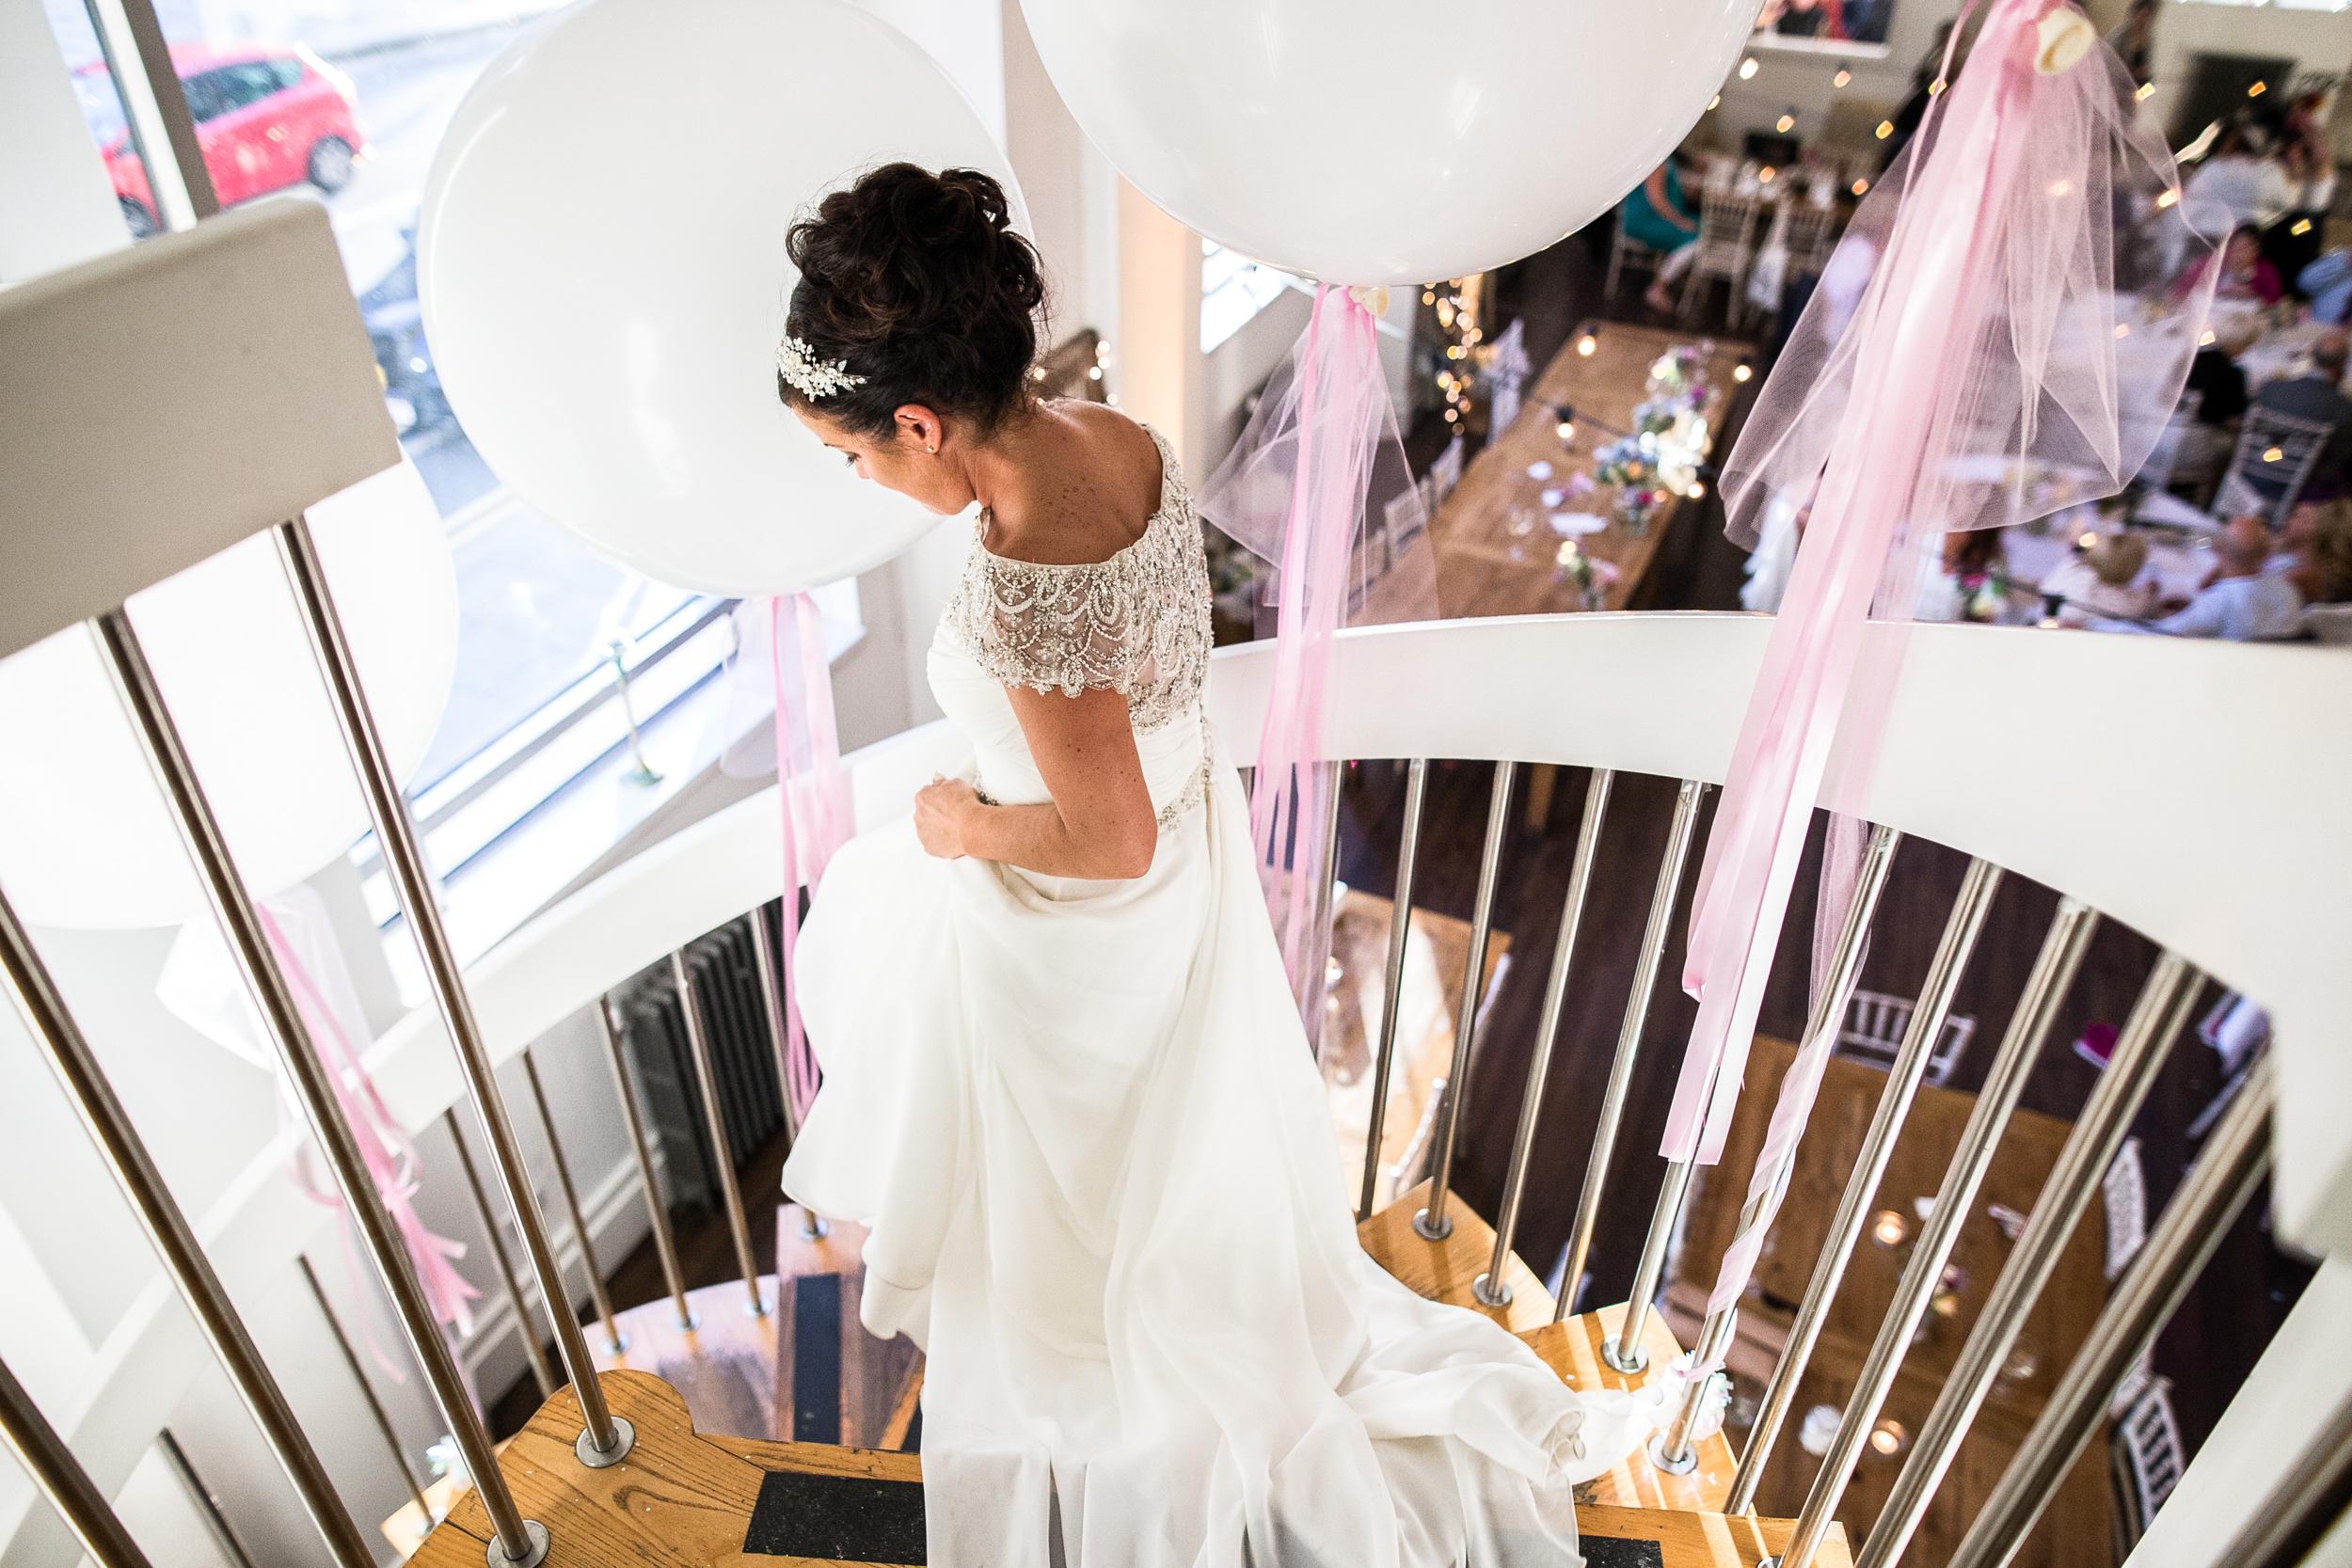 creative-wedding-photography-teesside-north-east-yorkshire-25.jpg